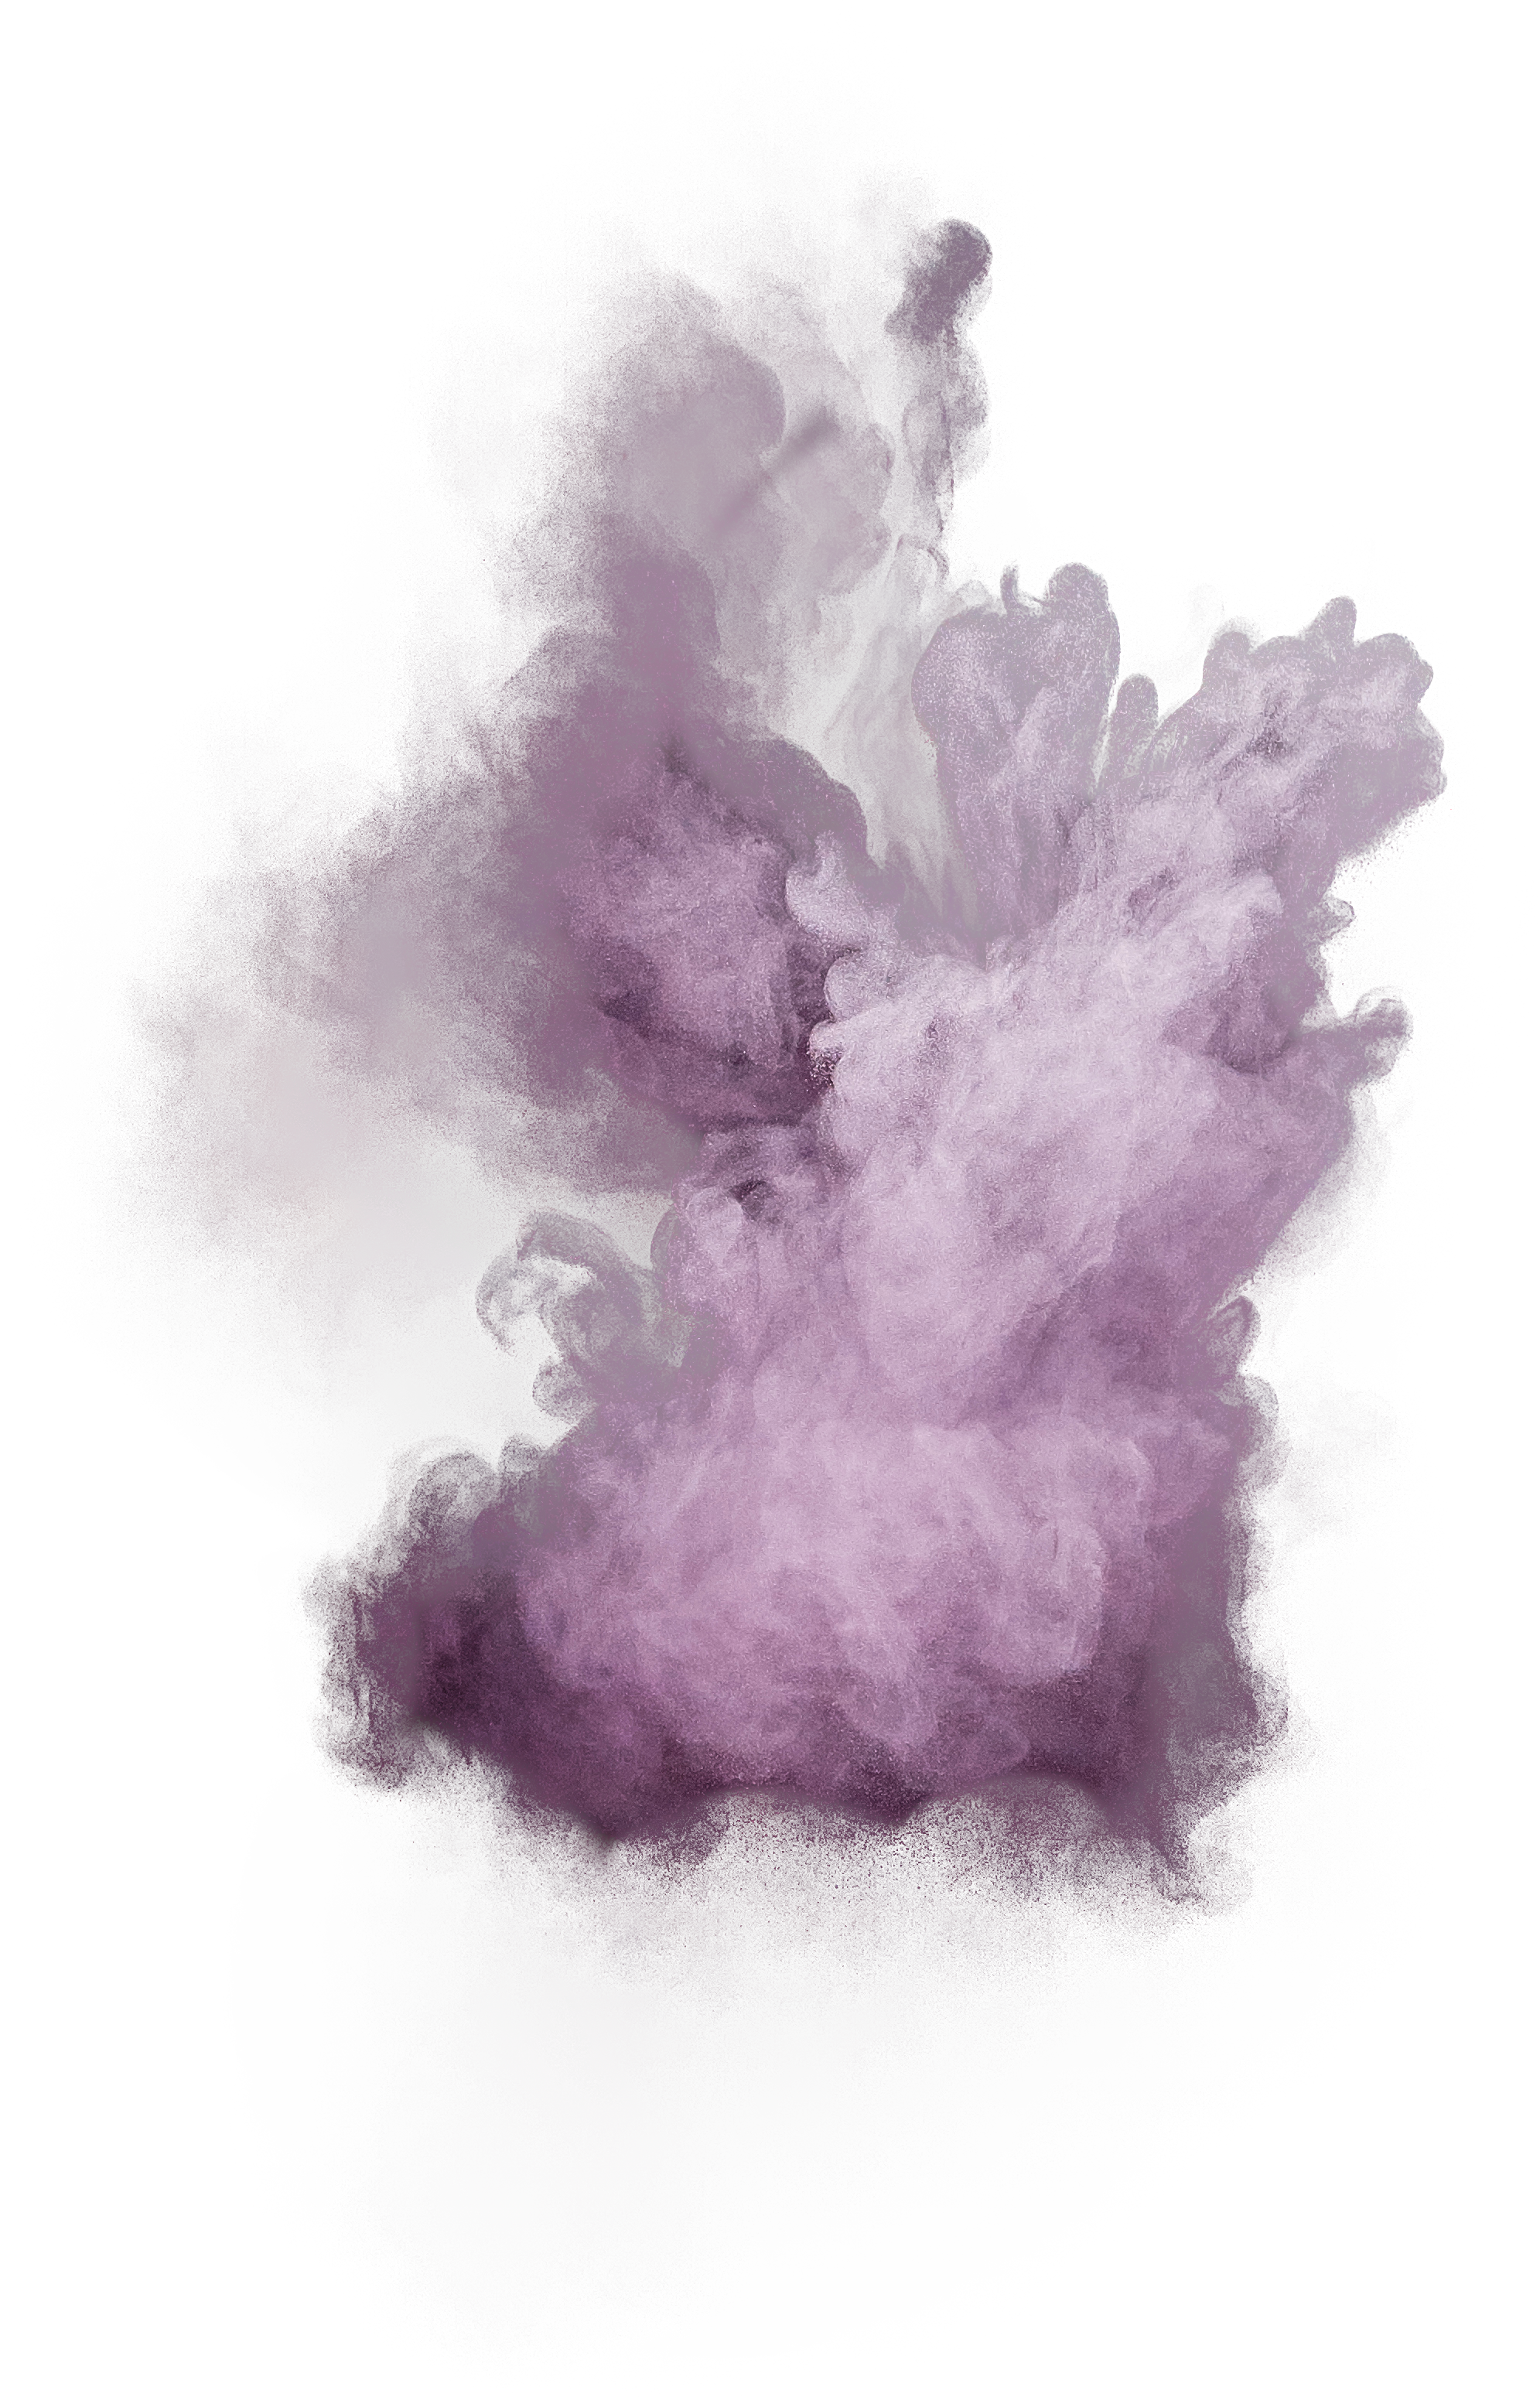 Purple Powder Explosion Png Image Watercolour Texture Background Purple Wallpaper Iphone Logo Design Inspiration